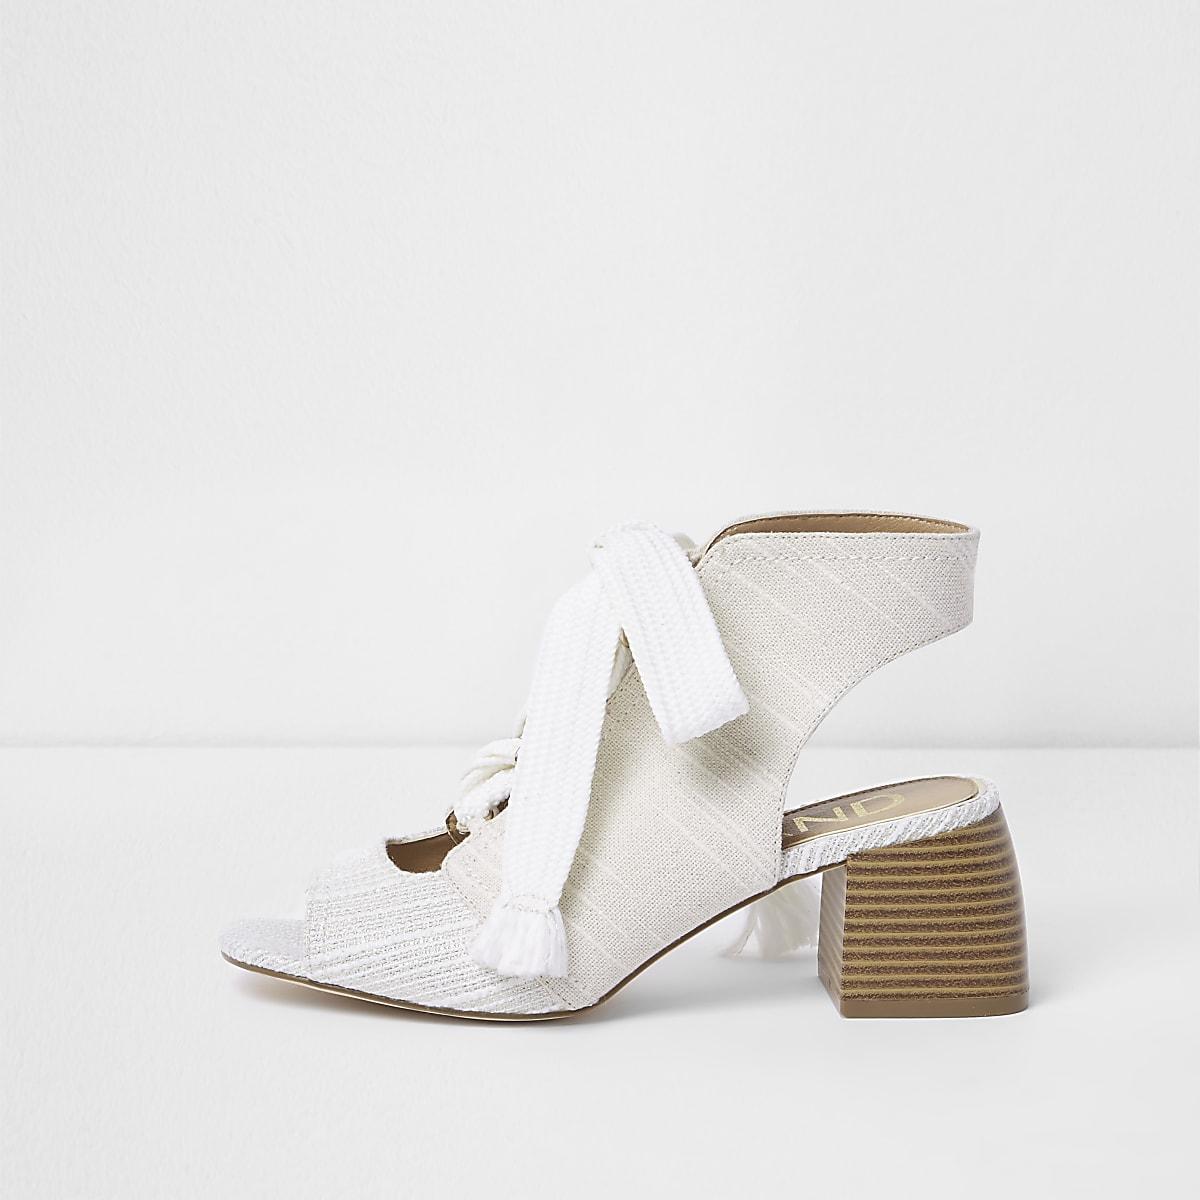 White canvas tie-up block heel shoe boots